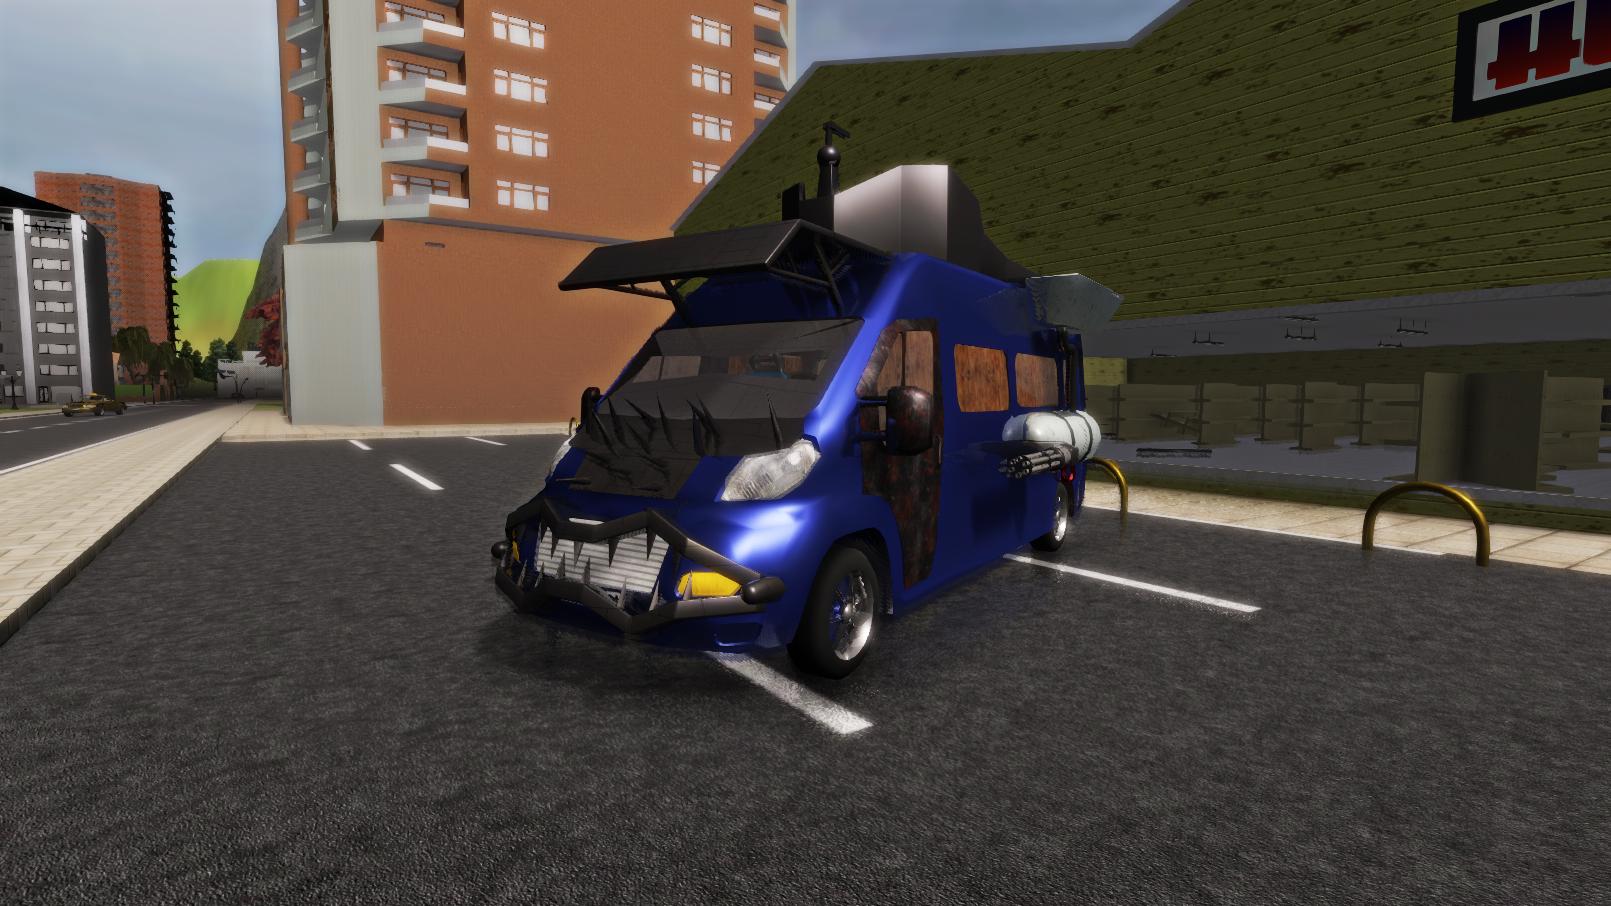 Vehicle 5